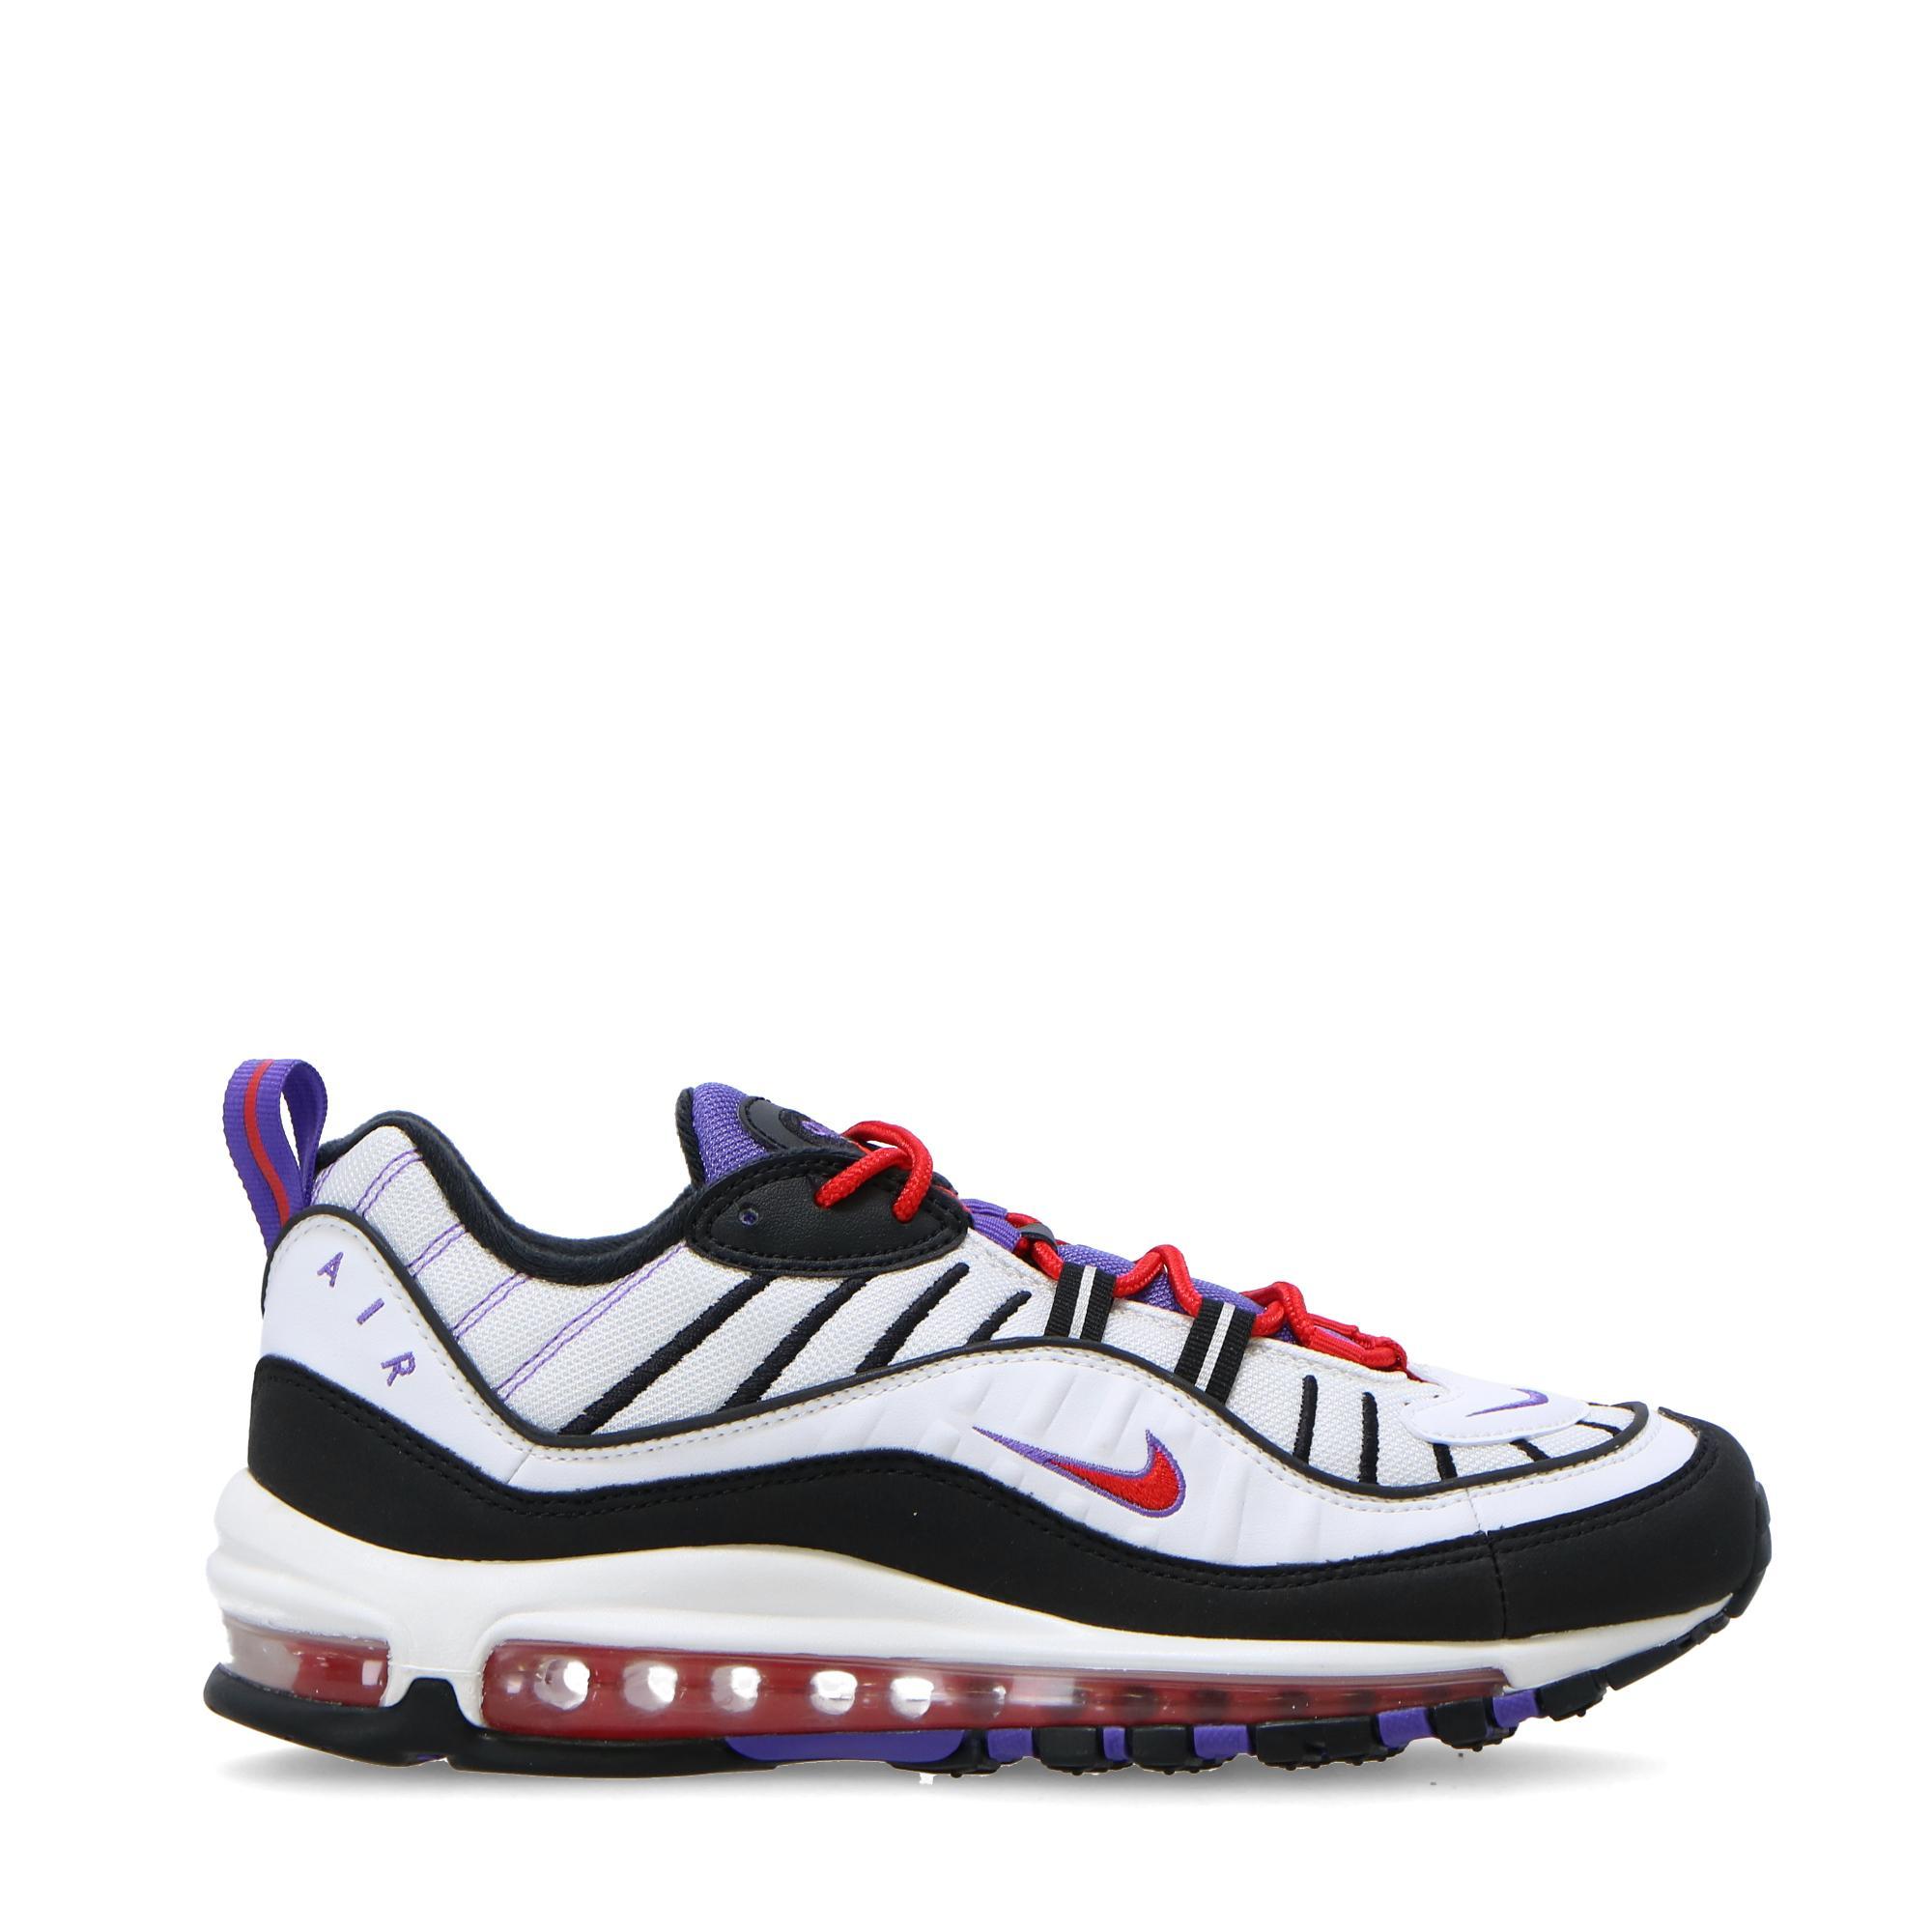 Scontate Prezzo Offerte Donne Nike Air Max @K#CQXxNT6 98